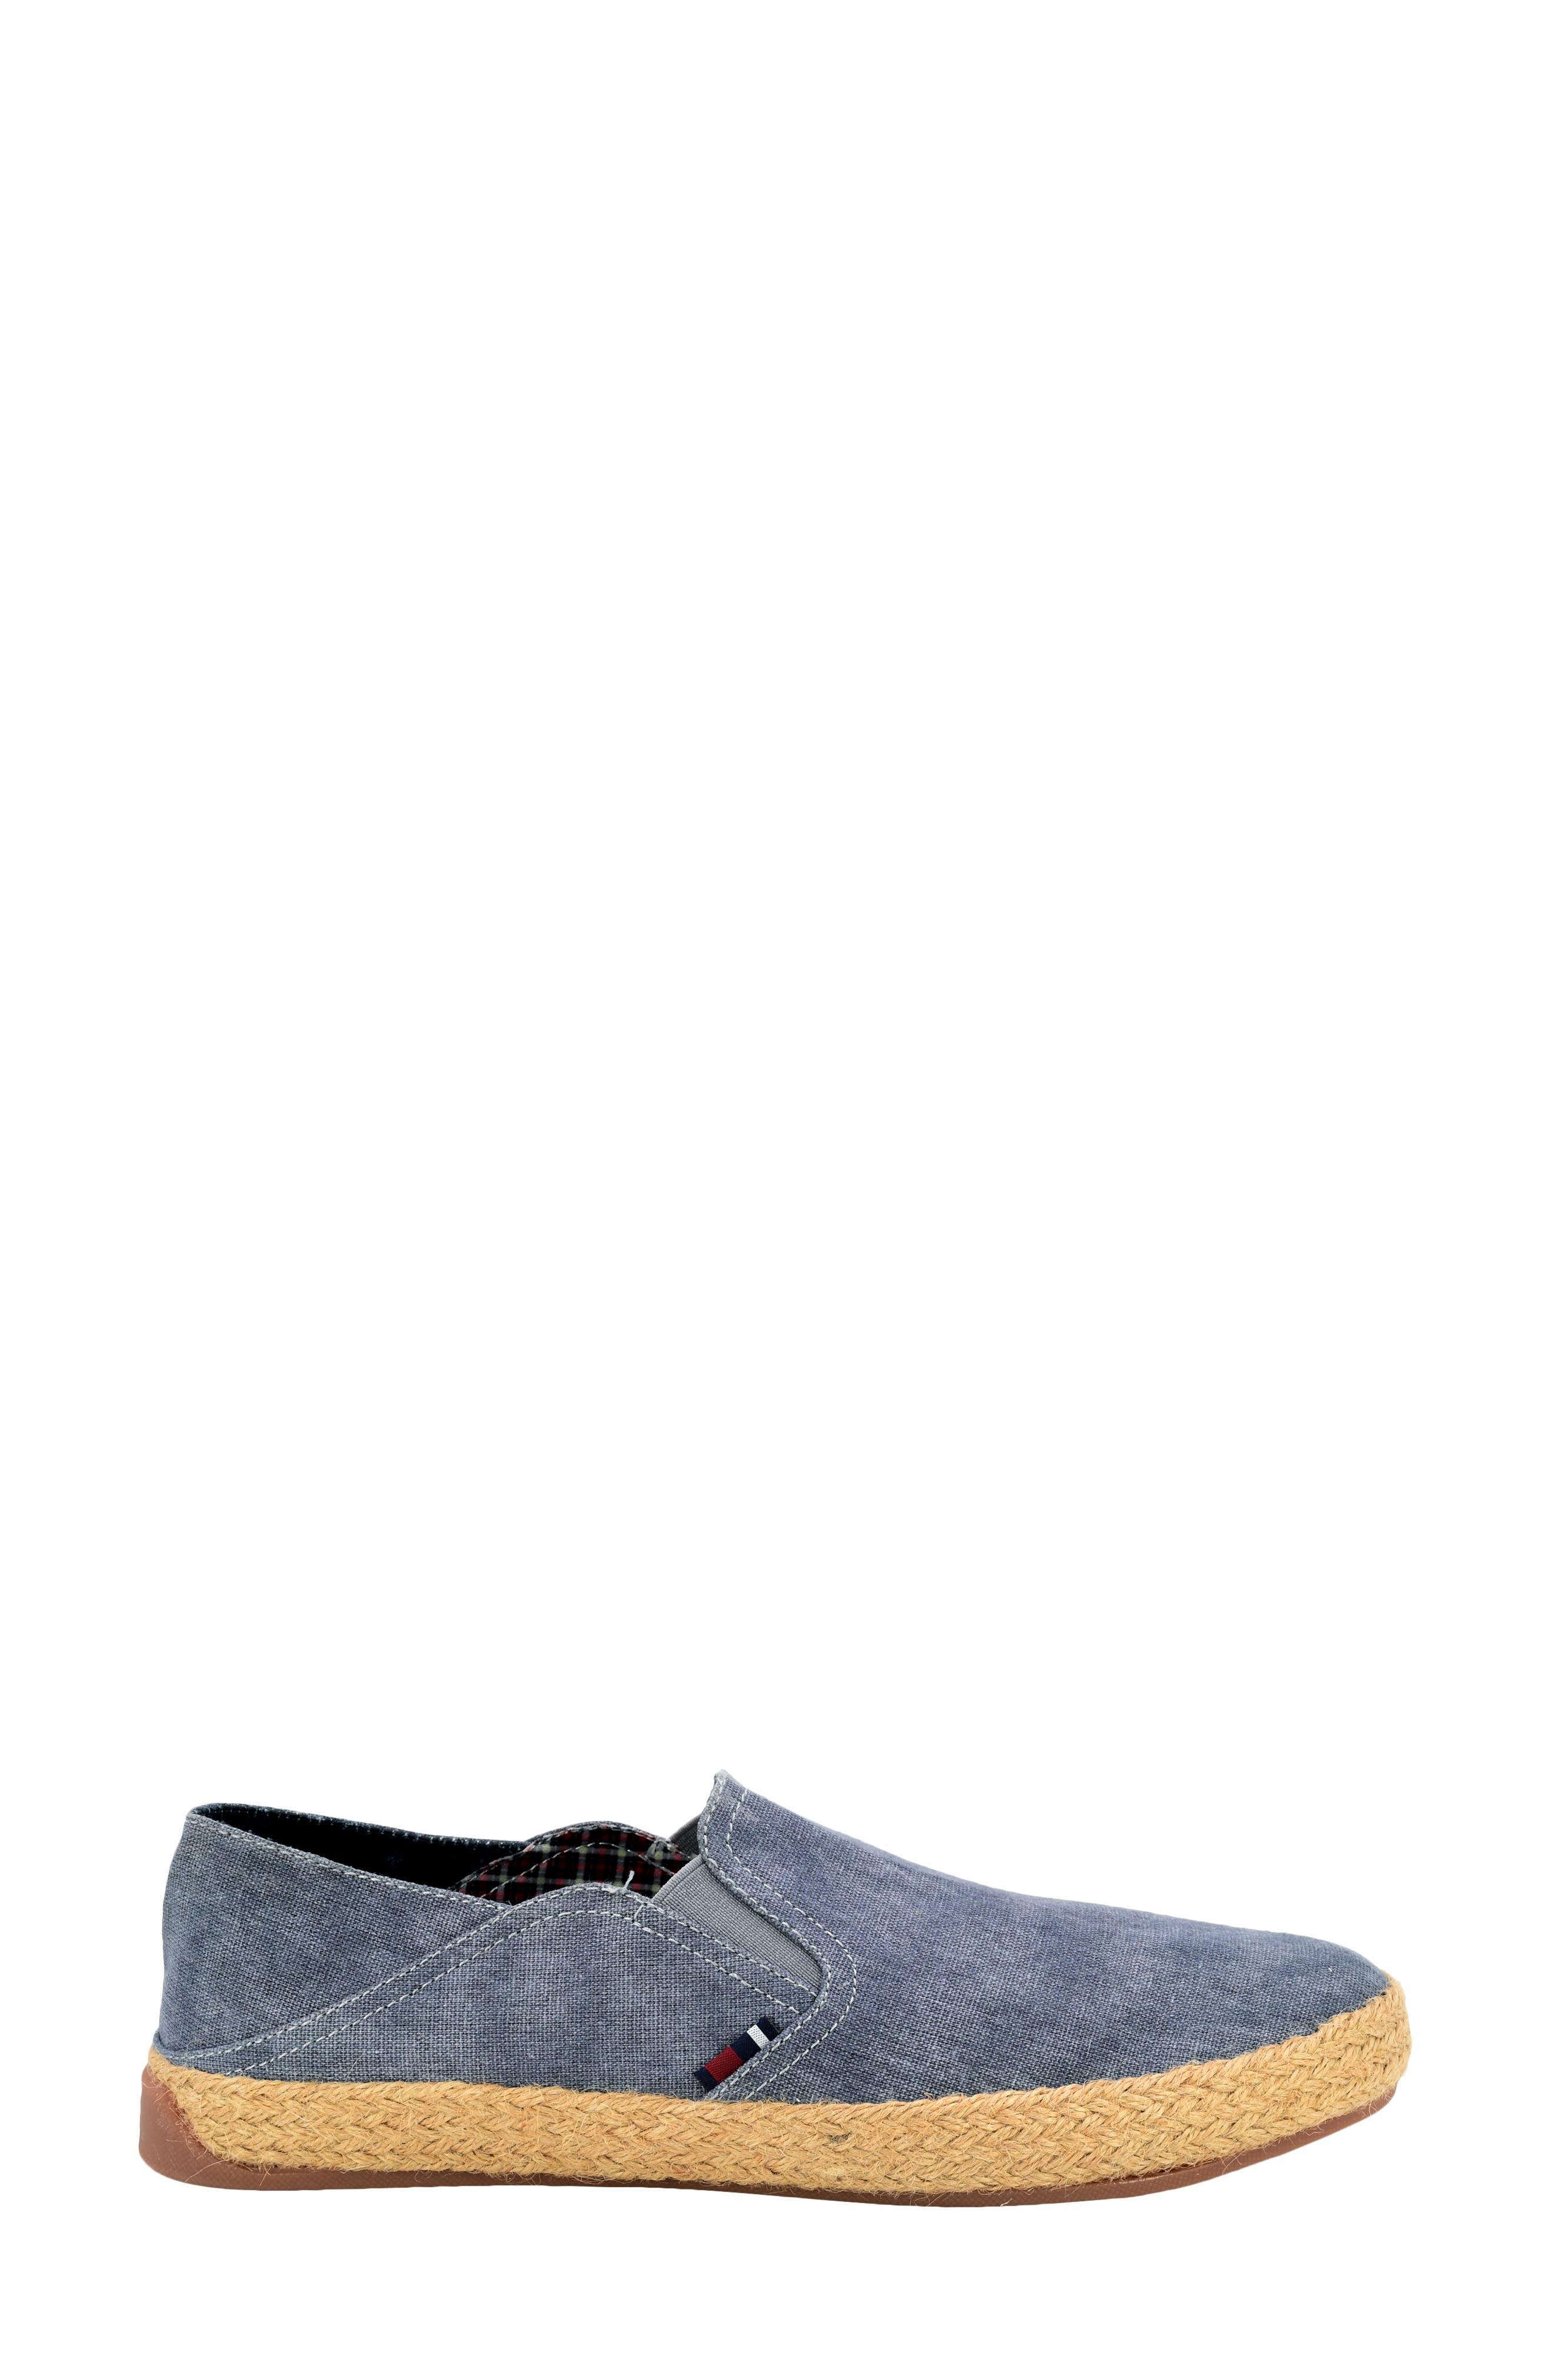 Prill Slip-On Sneaker